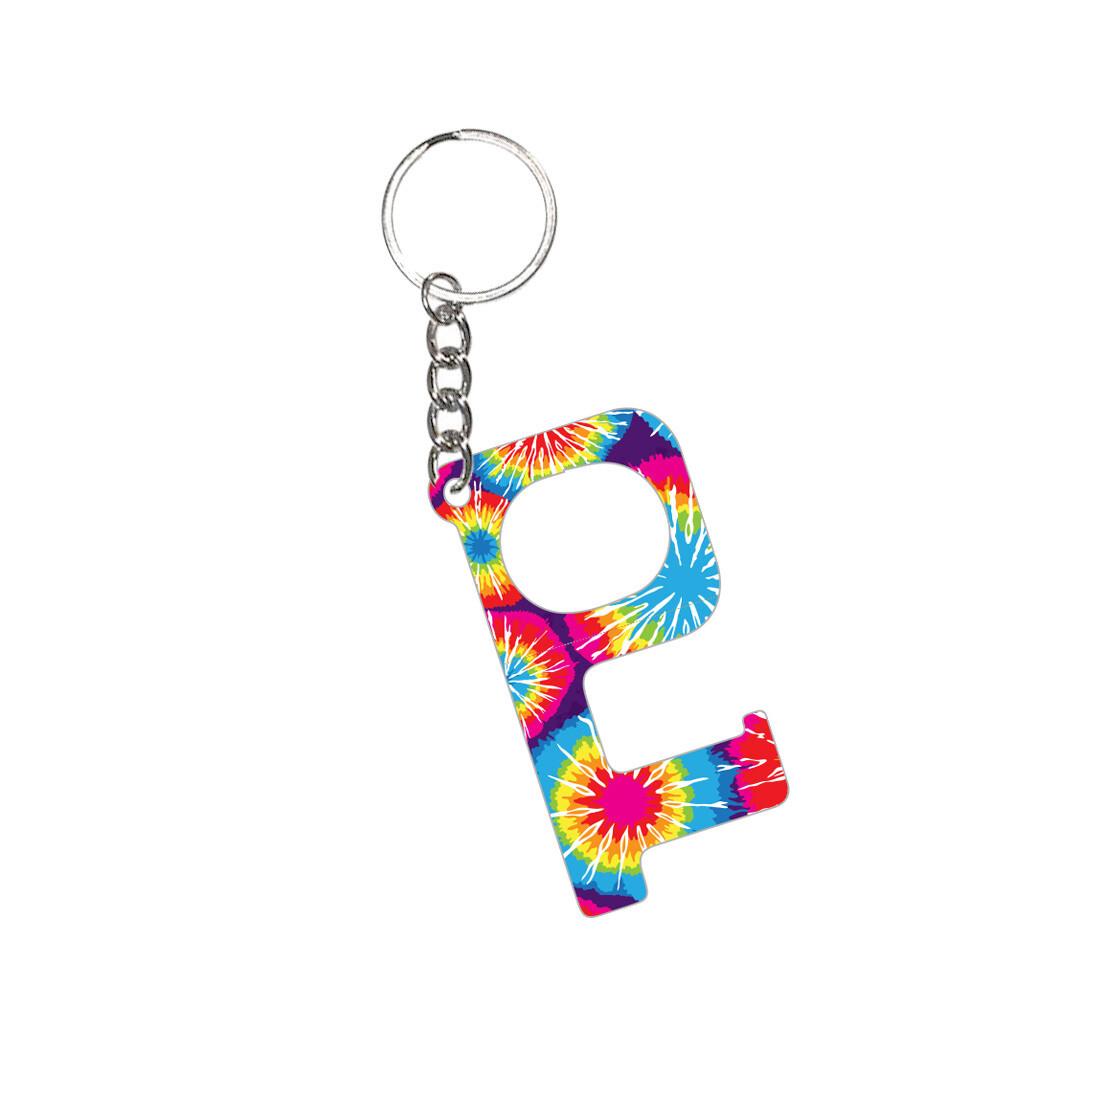 Tie Dye Hands-Free Keychain